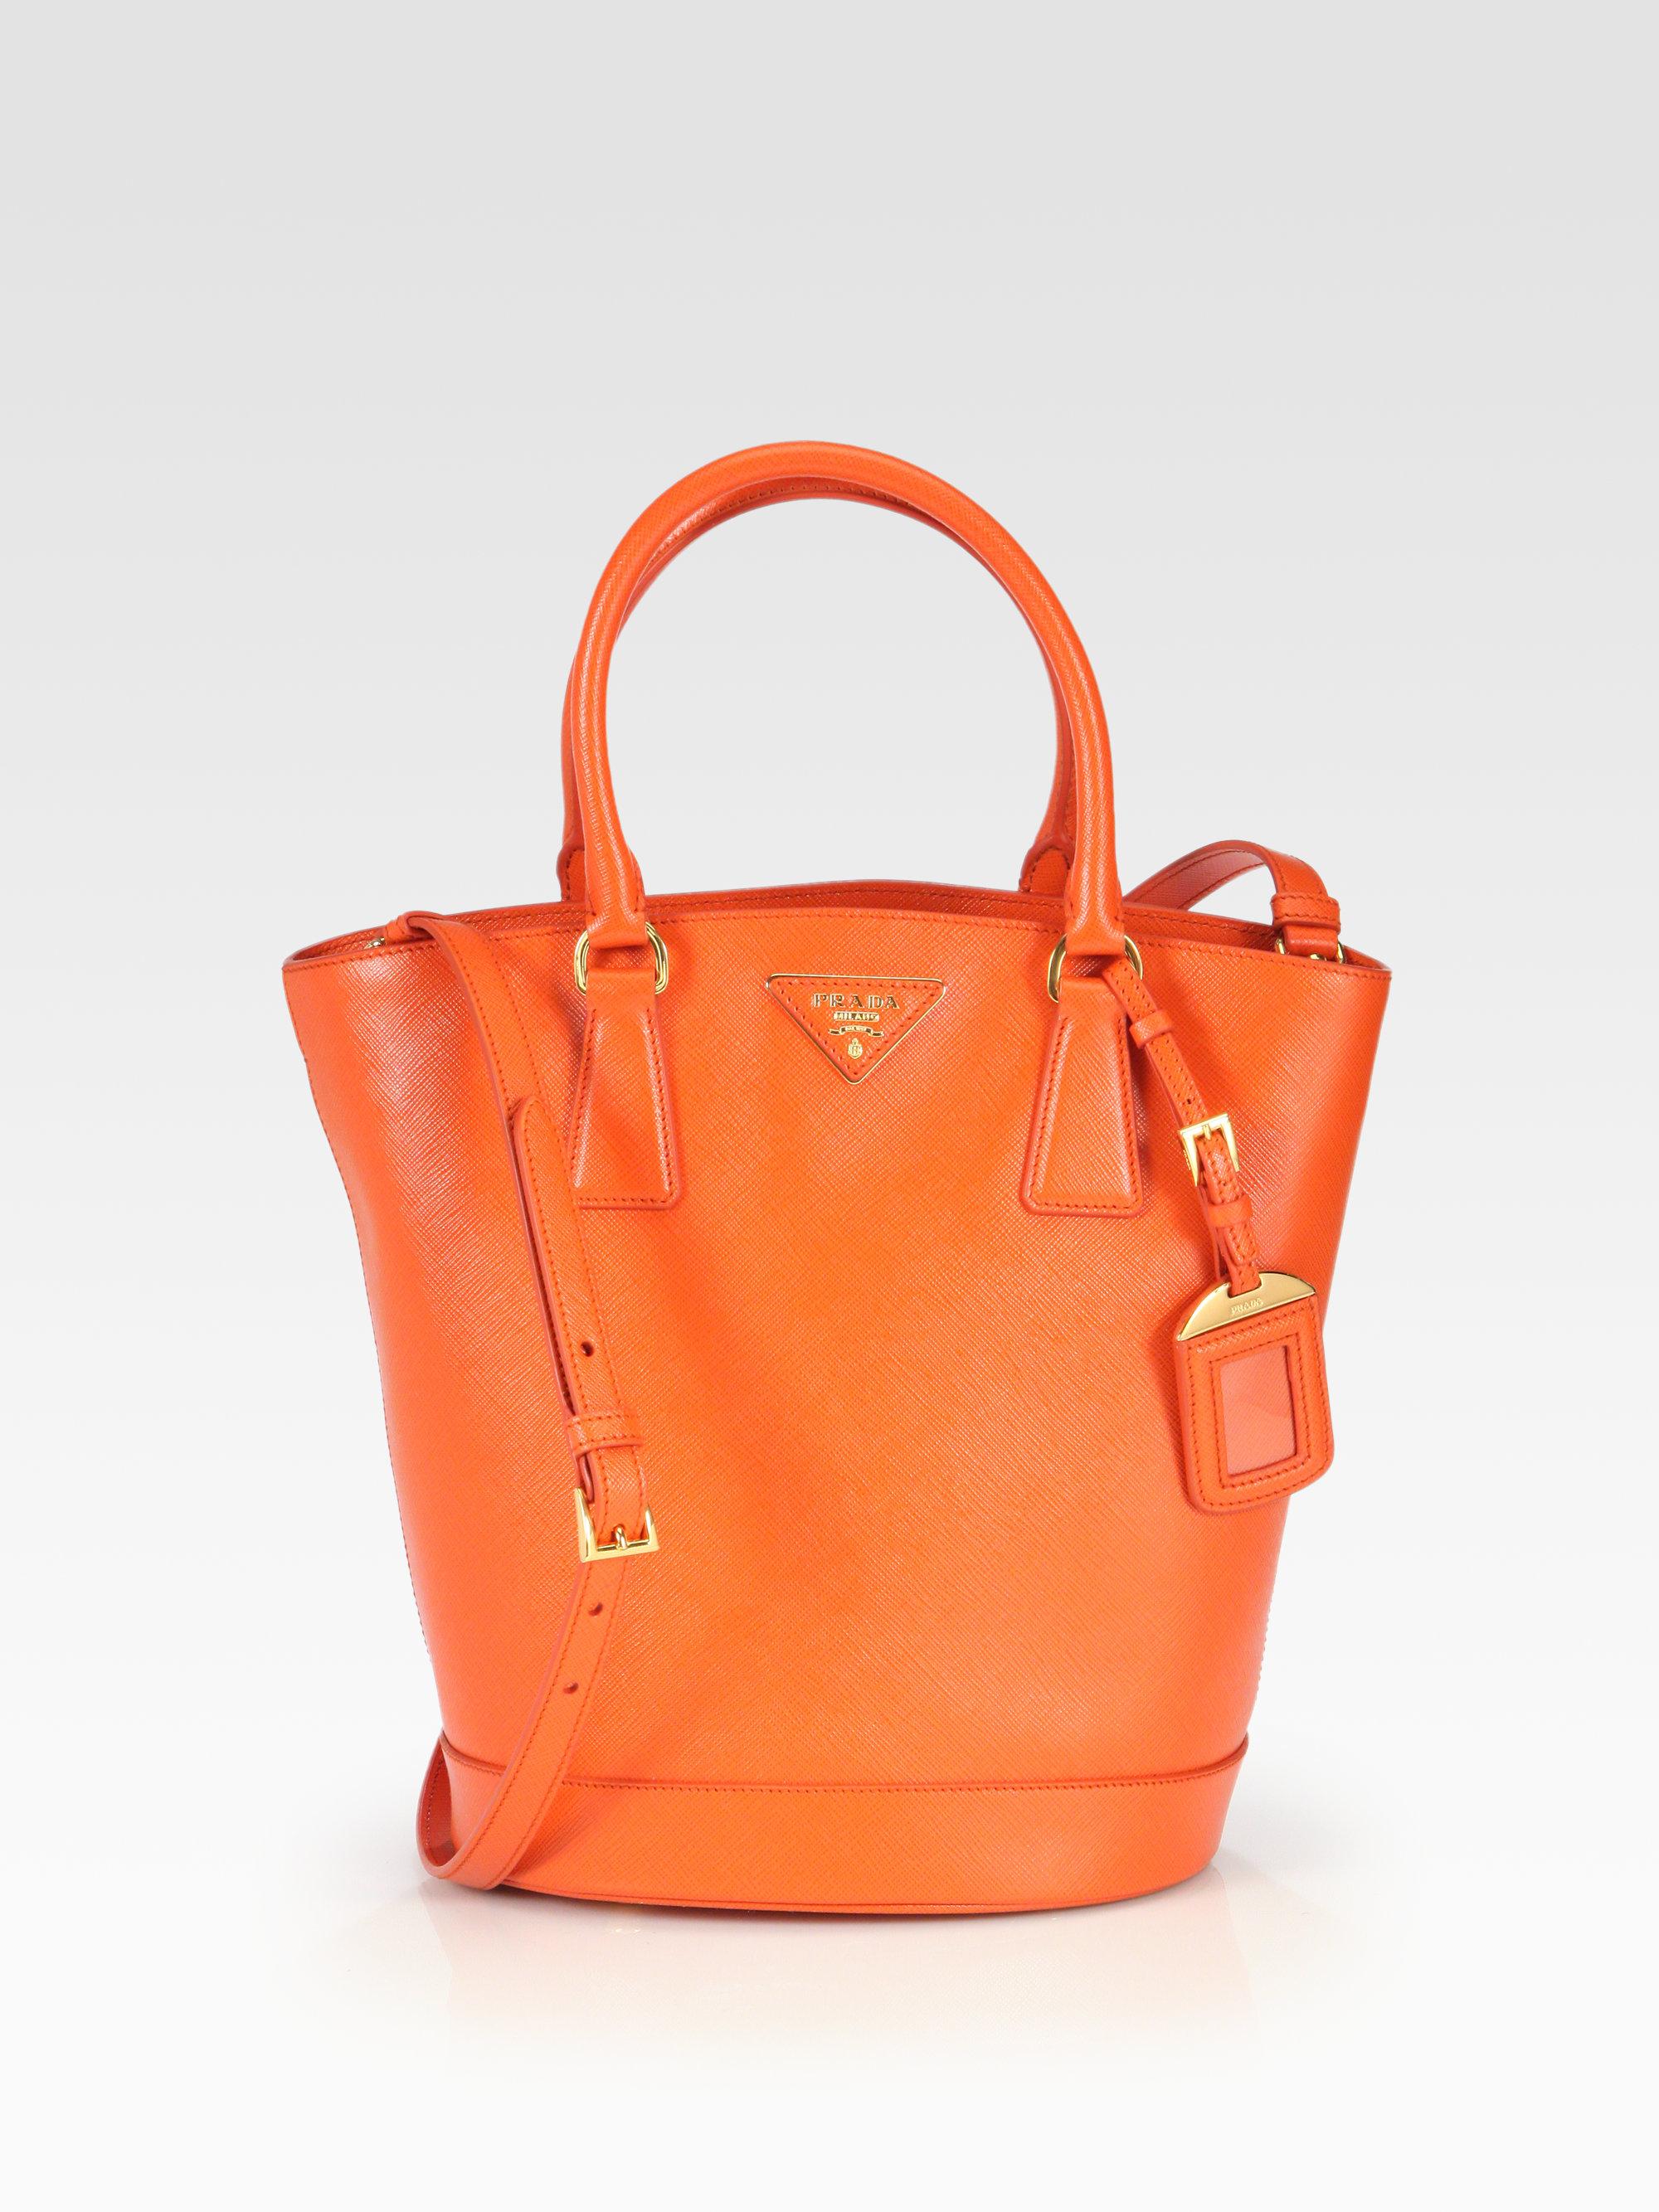 c0614412573509 Prada Saffiano Lux Convertible Bucket Bag in Orange - Lyst